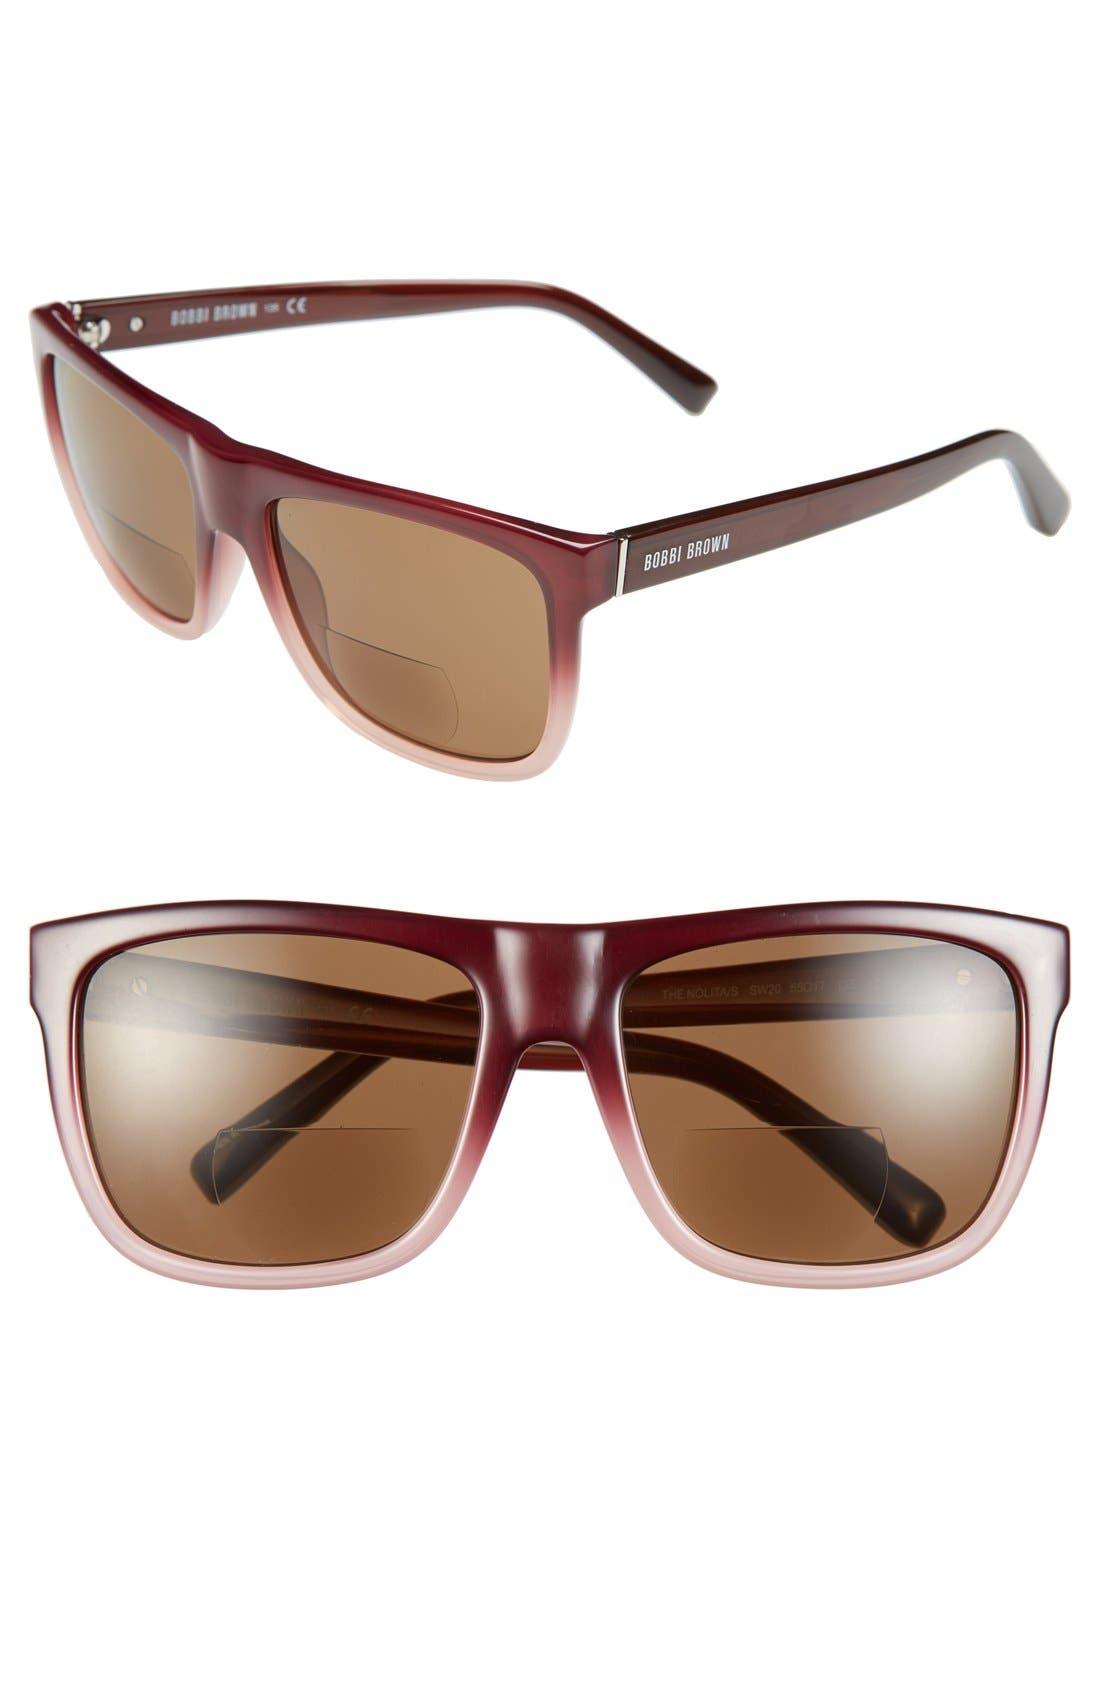 Alternate Image 1 Selected - Bobbi Brown 'The Nolita' 55mm Reading Sunglasses (2 for $88)